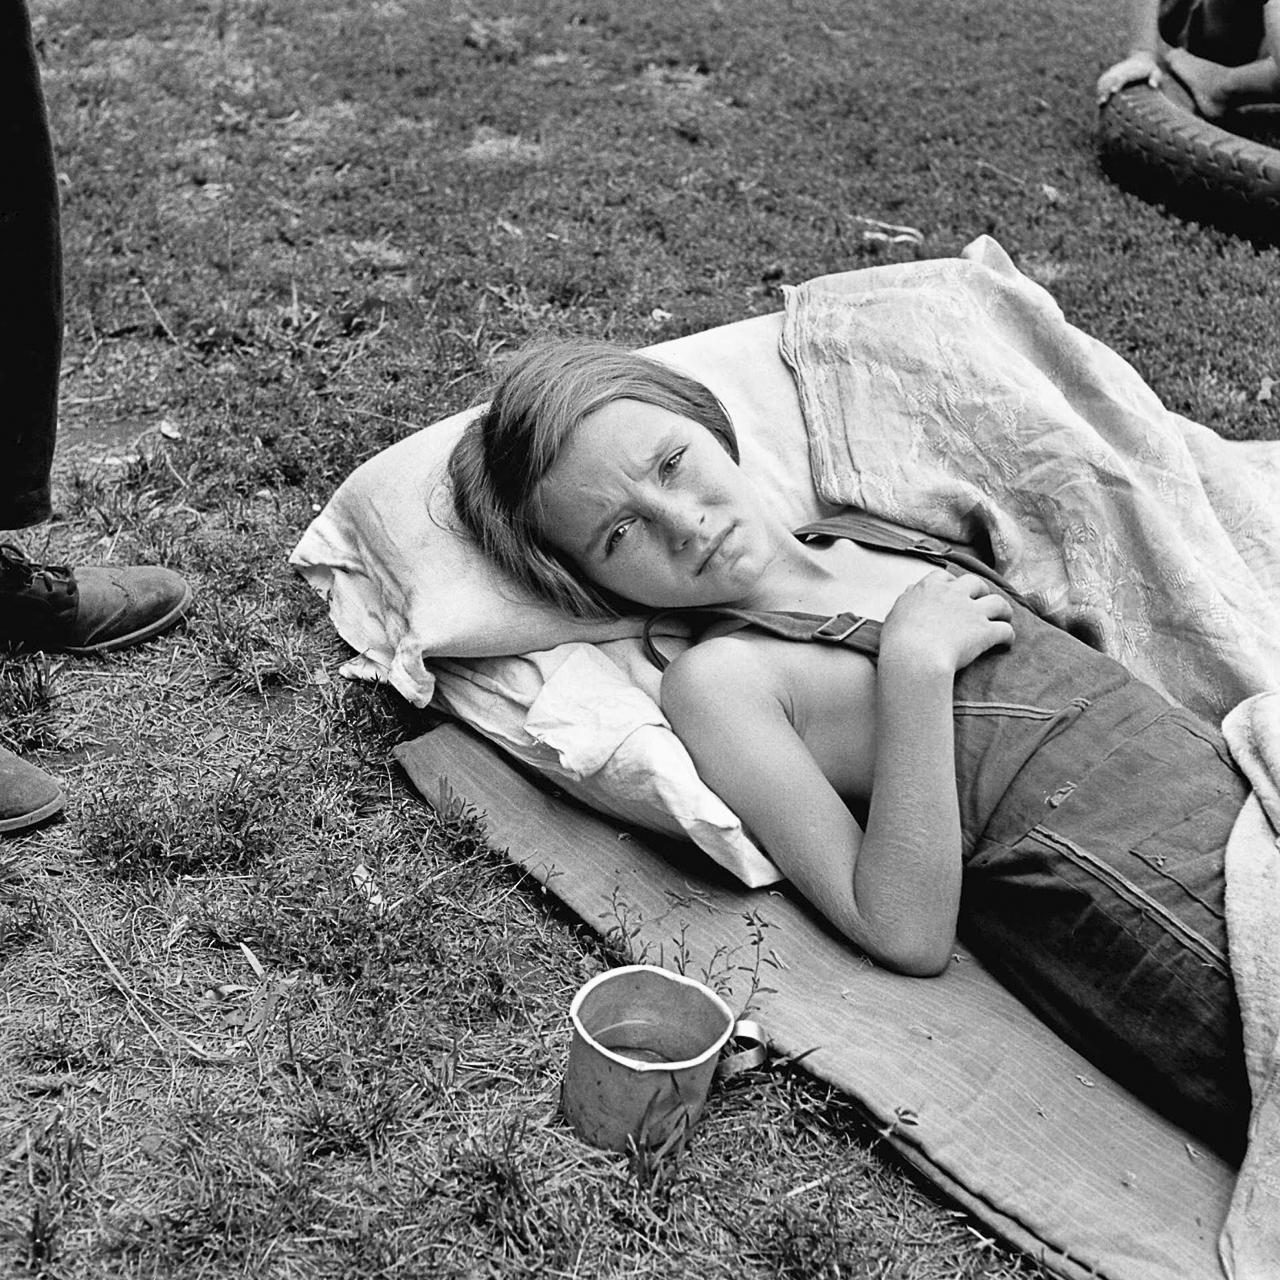 Dorothea Lange, <em>MIGRANT GIRL, 1930'S. /nA sick migrant girl resting on a makeshift bed outside, Yakima Valley, Toppenish, Washington.</em>